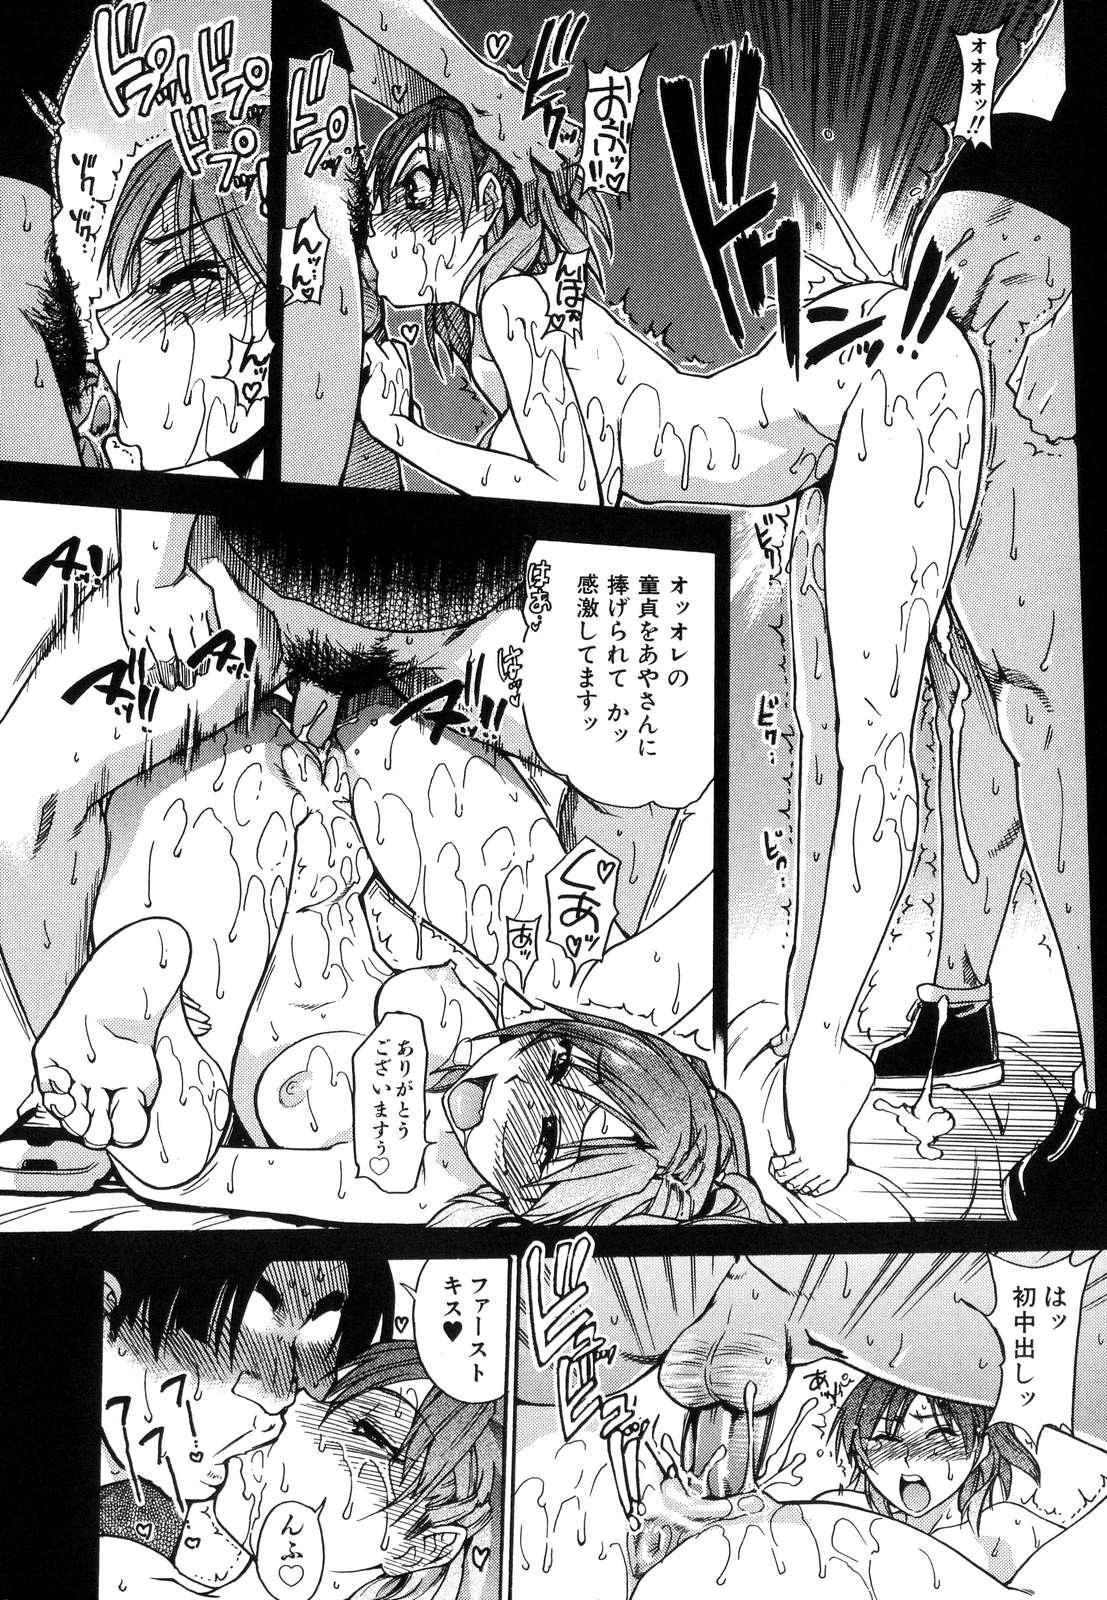 Shining Musume. 6. Rainbow Six 91